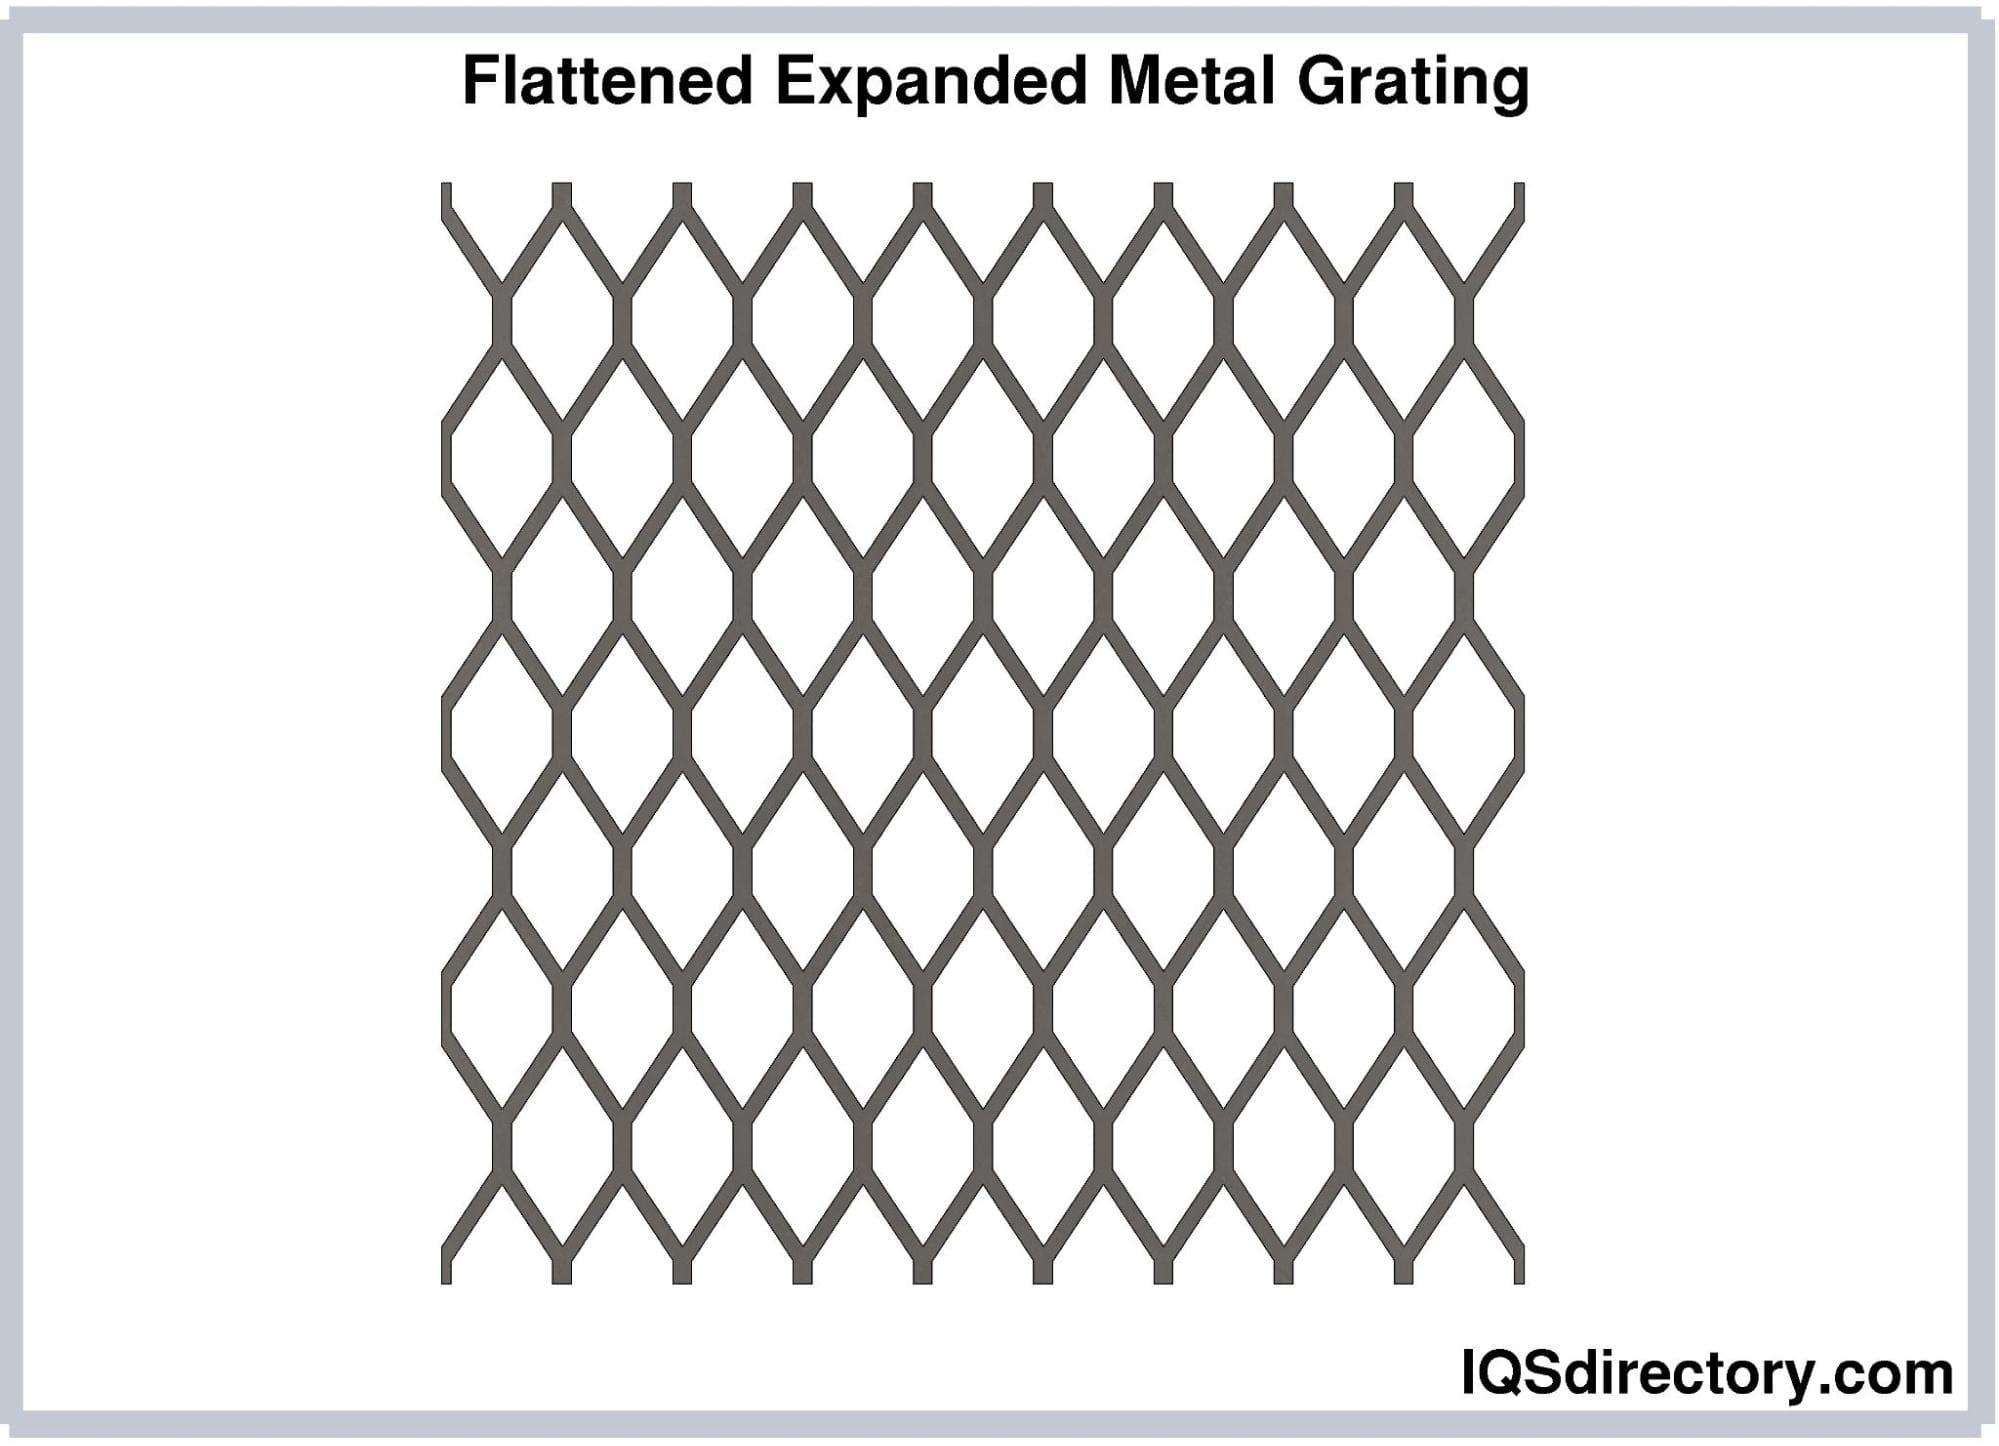 Flattened Expanded Metal Grating